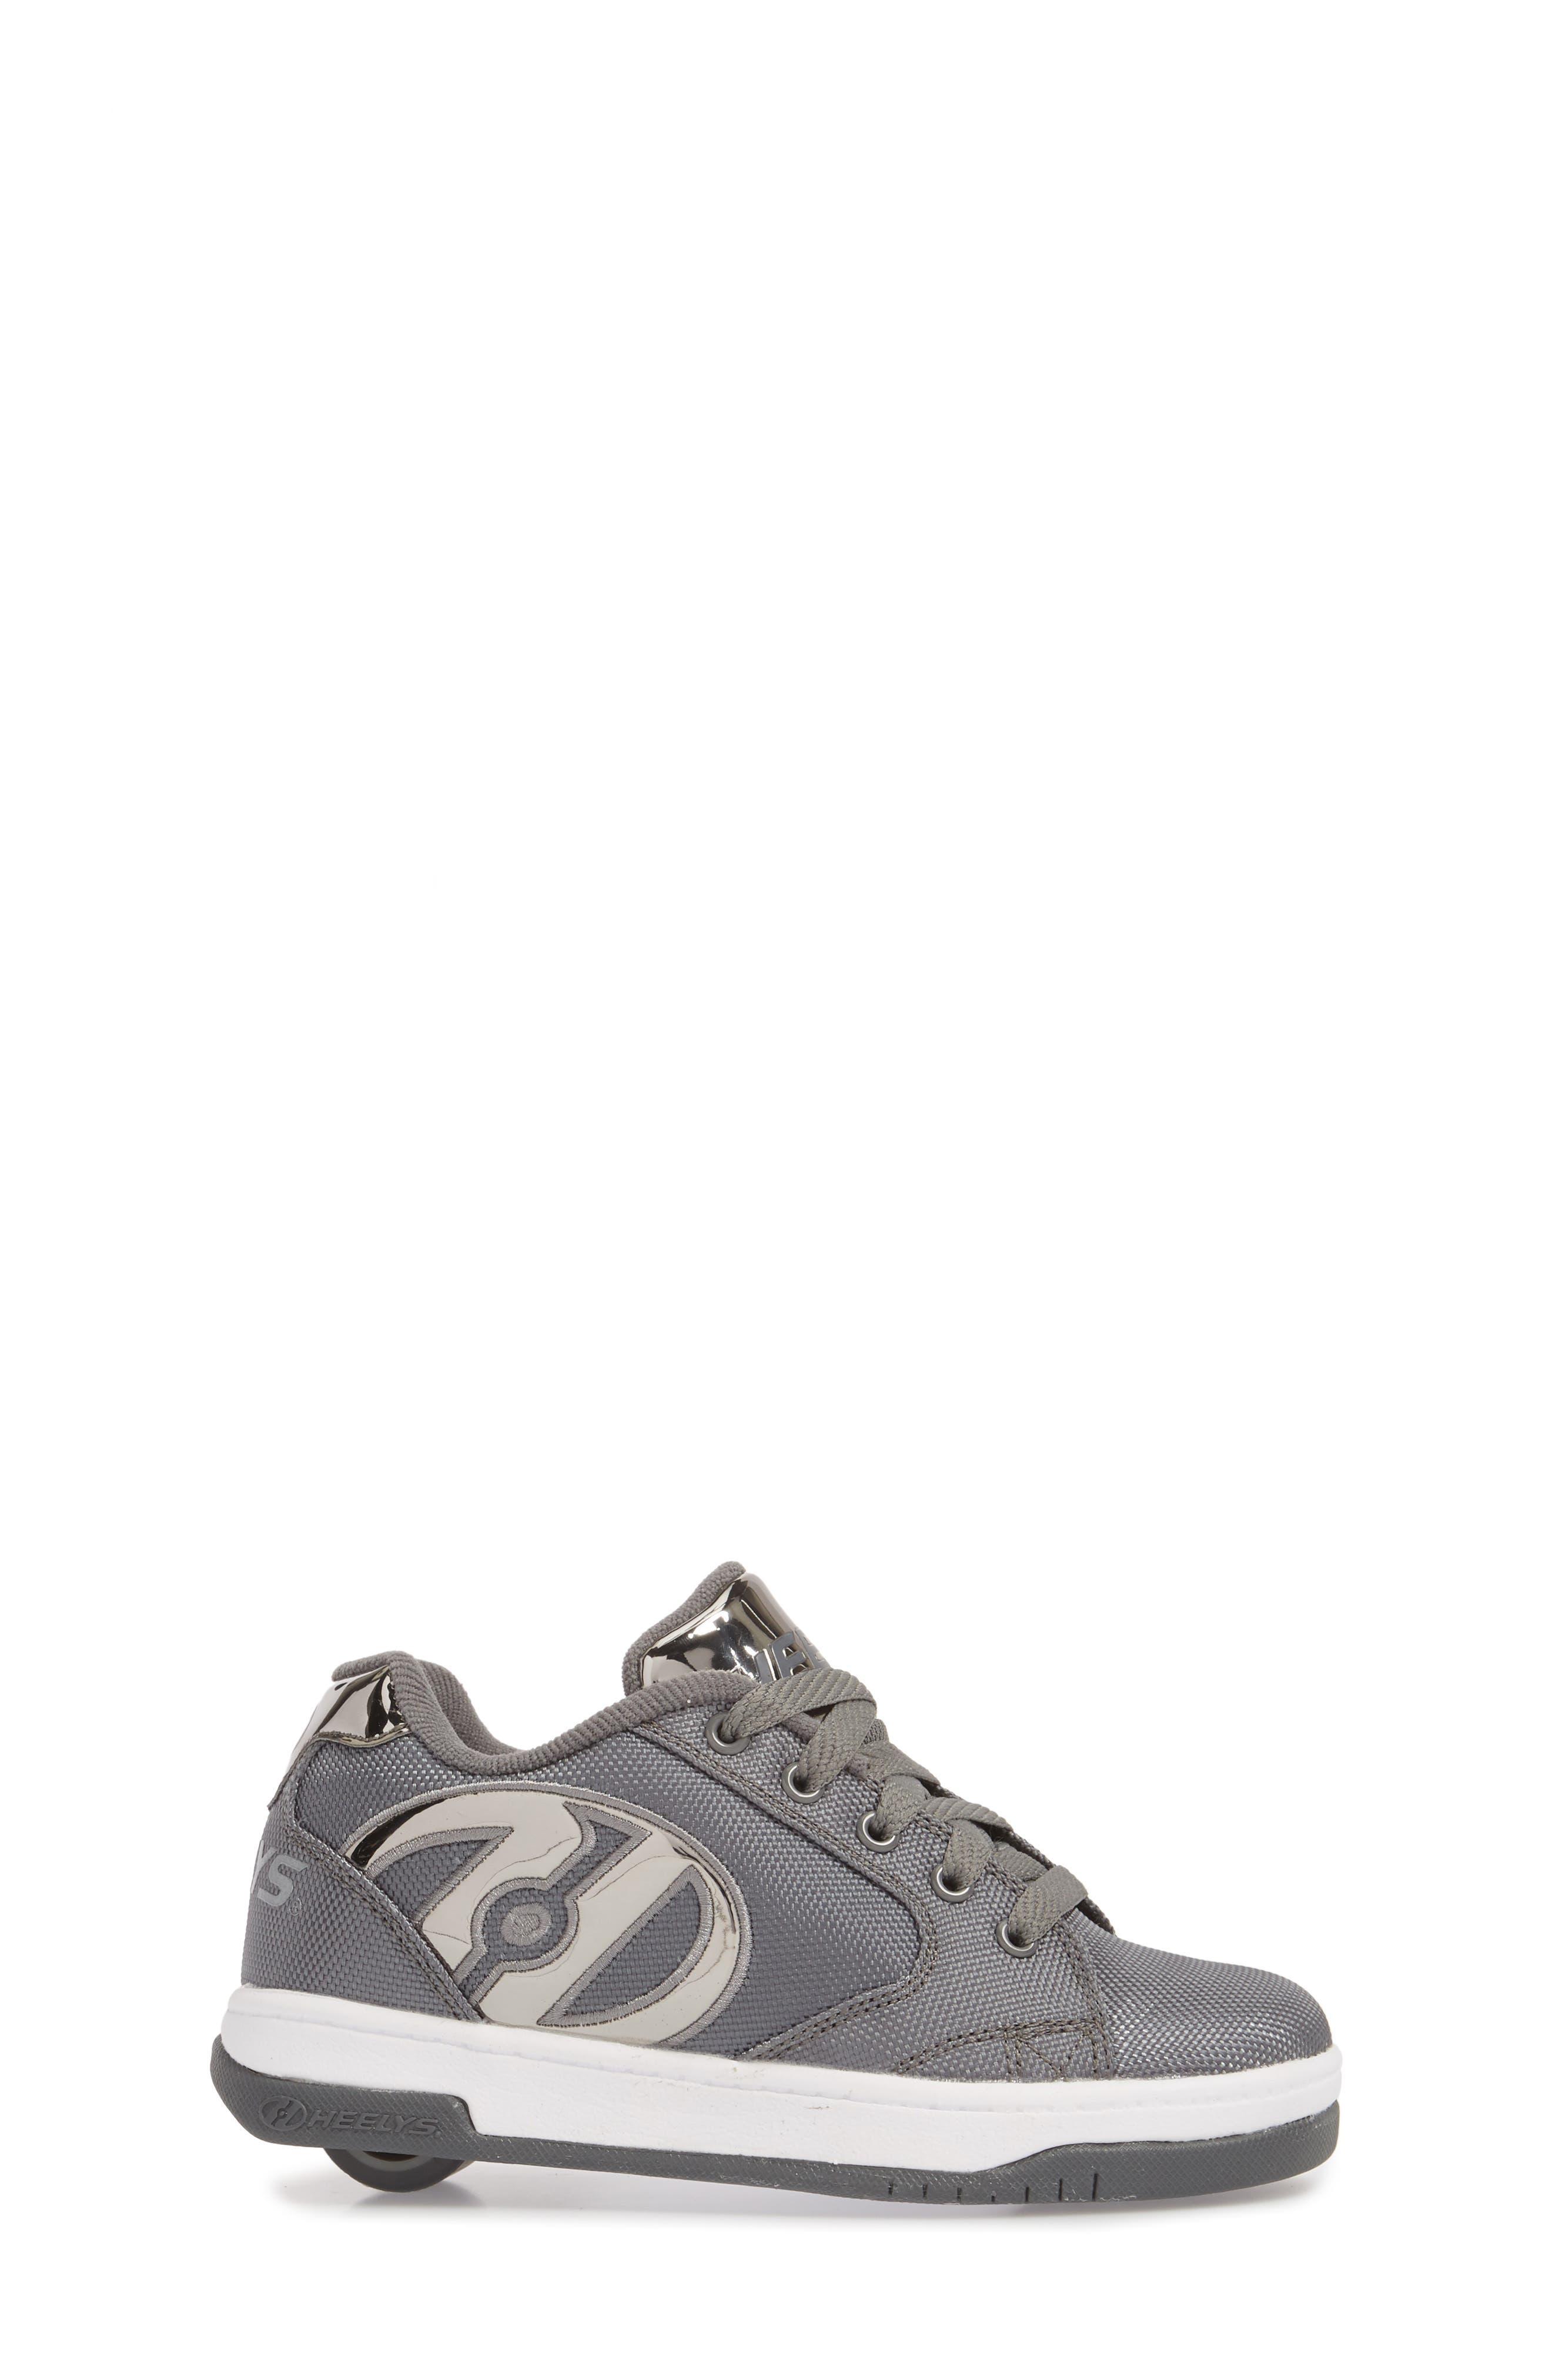 Heels Propel Ballistic Sneaker,                             Alternate thumbnail 3, color,                             Charcoal/ Pewter